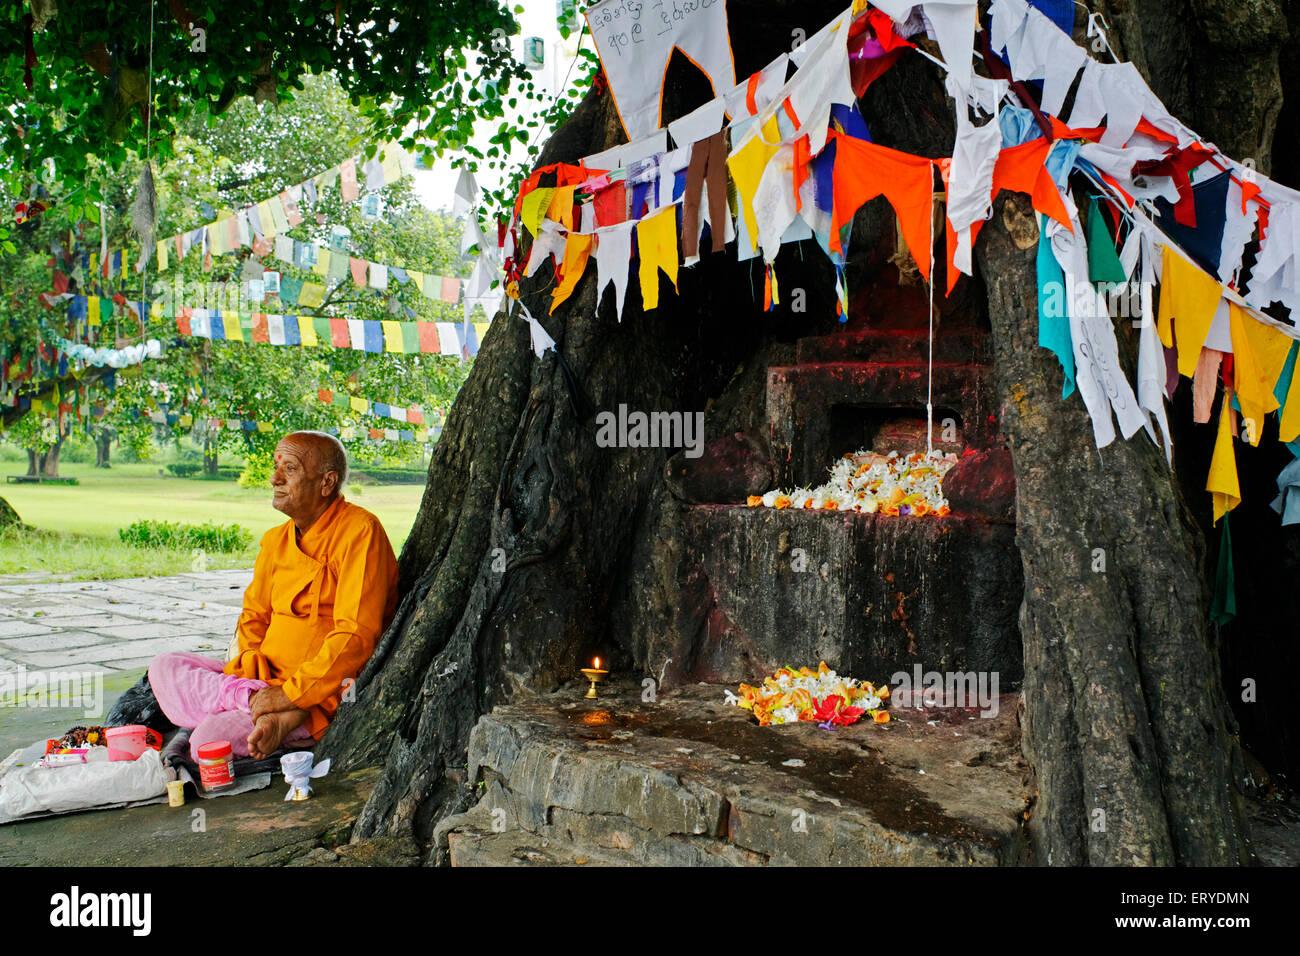 Holy man sitting ; UNESCO World Heritage site ; Gautam Buddha's birthplace at Lumbini ; Nepal - Stock Image